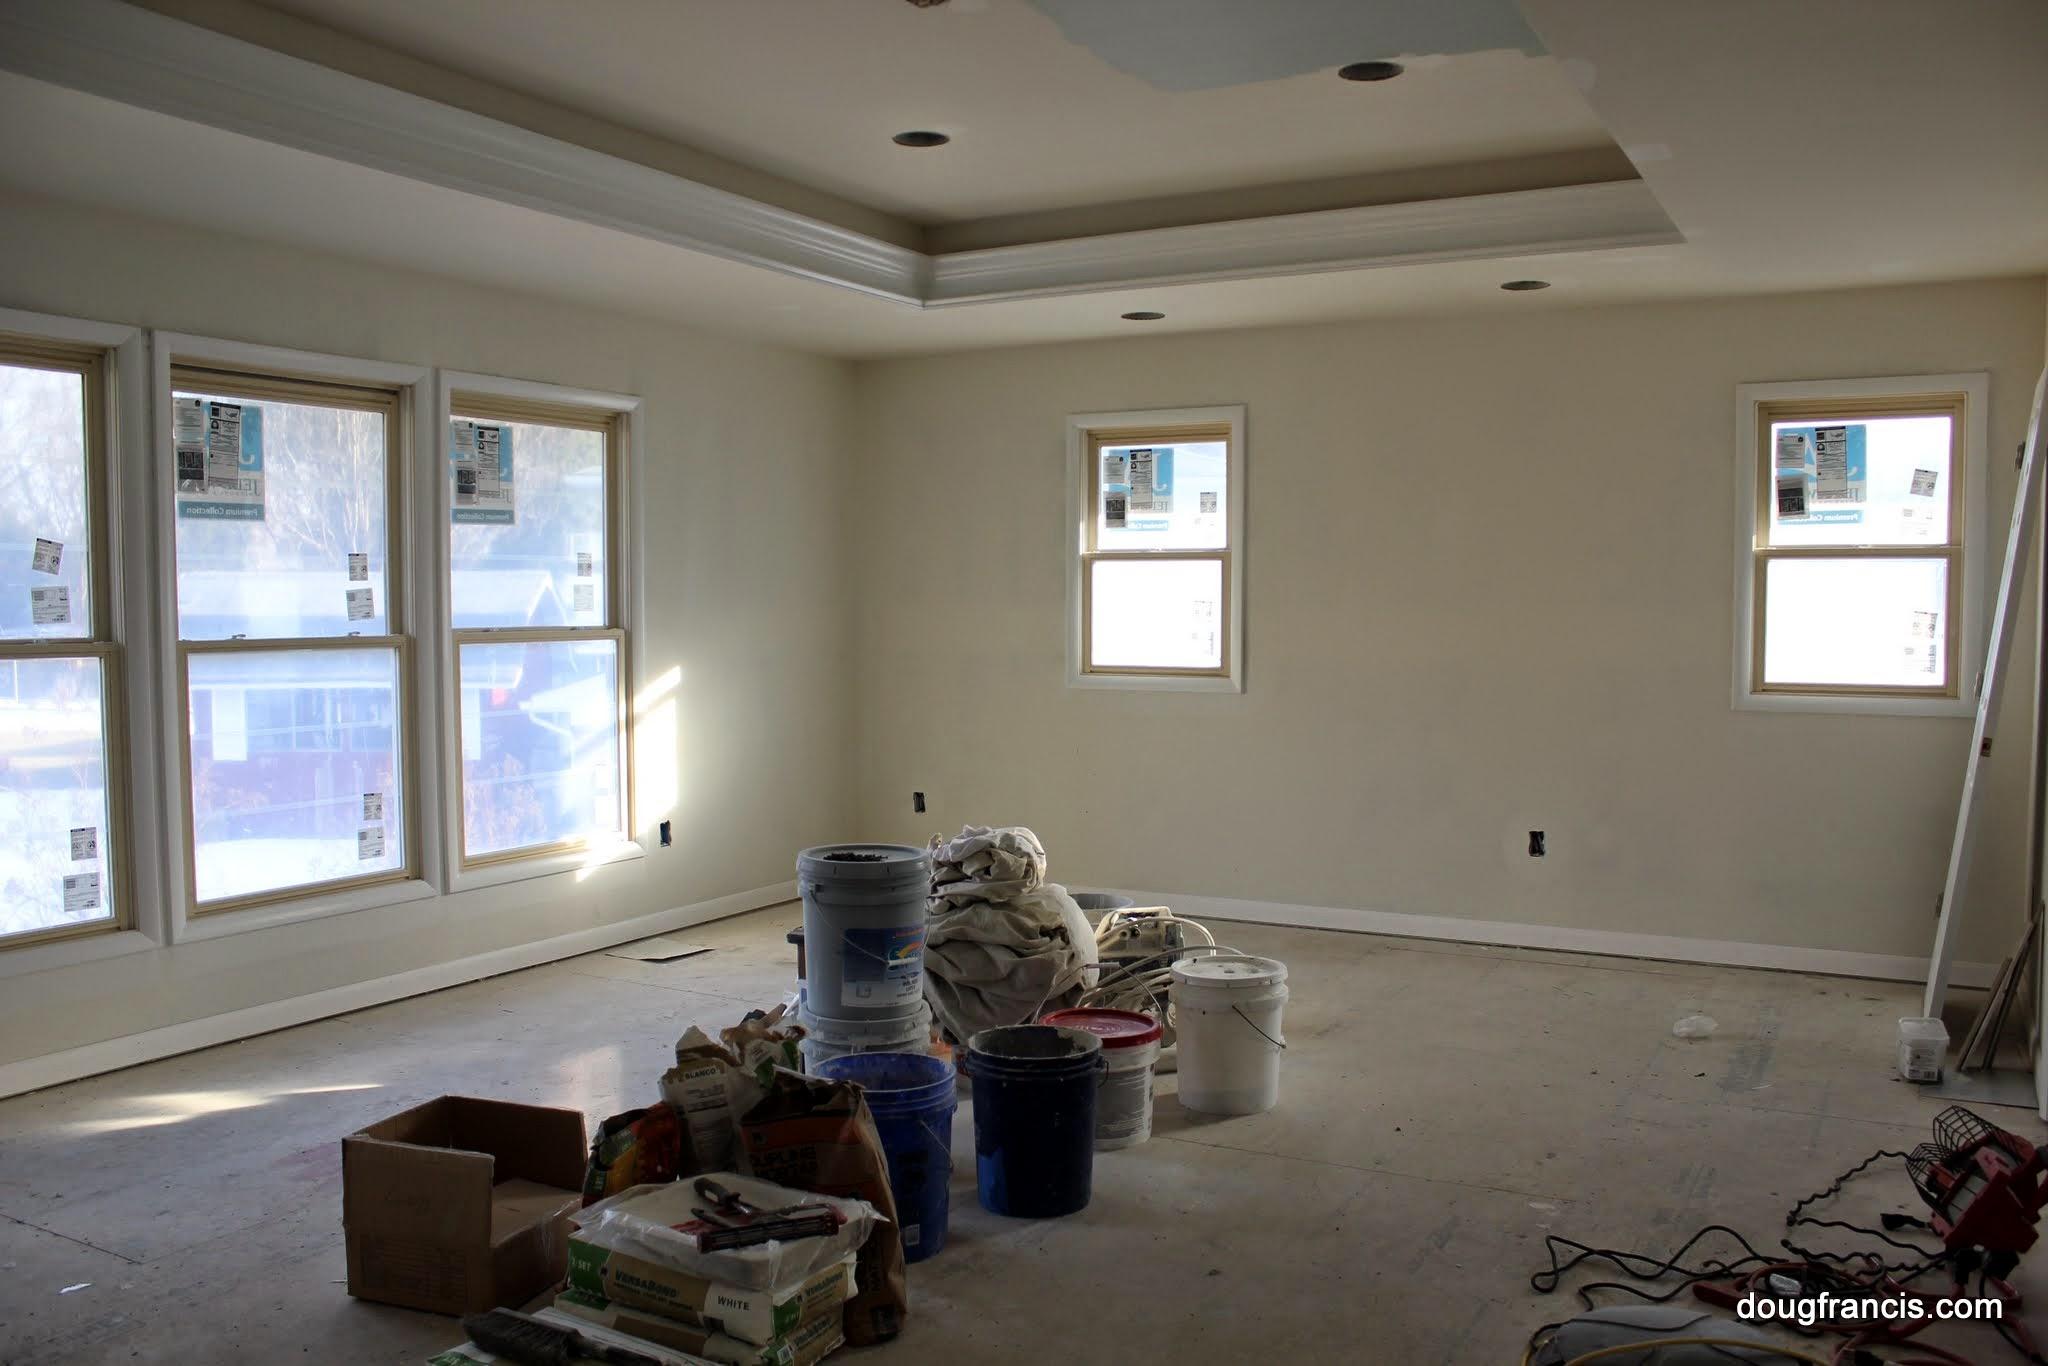 Delicieux New Bedroom Addition Over Garage. U201c